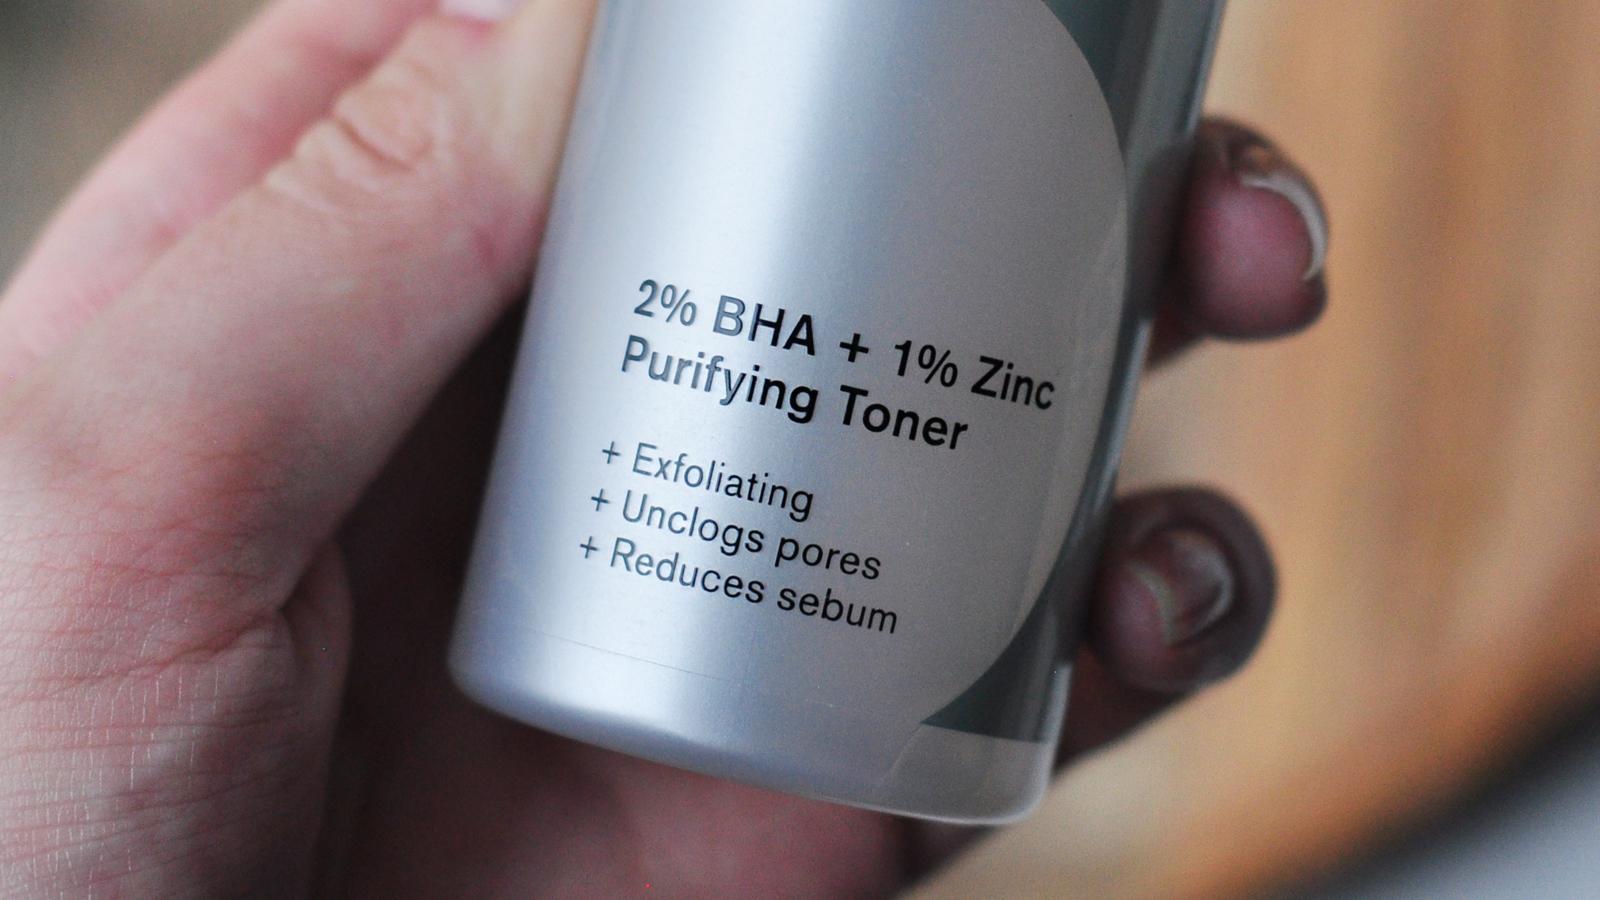 Beauty Act 2% BHA + 1% Zinc Purifying Toner